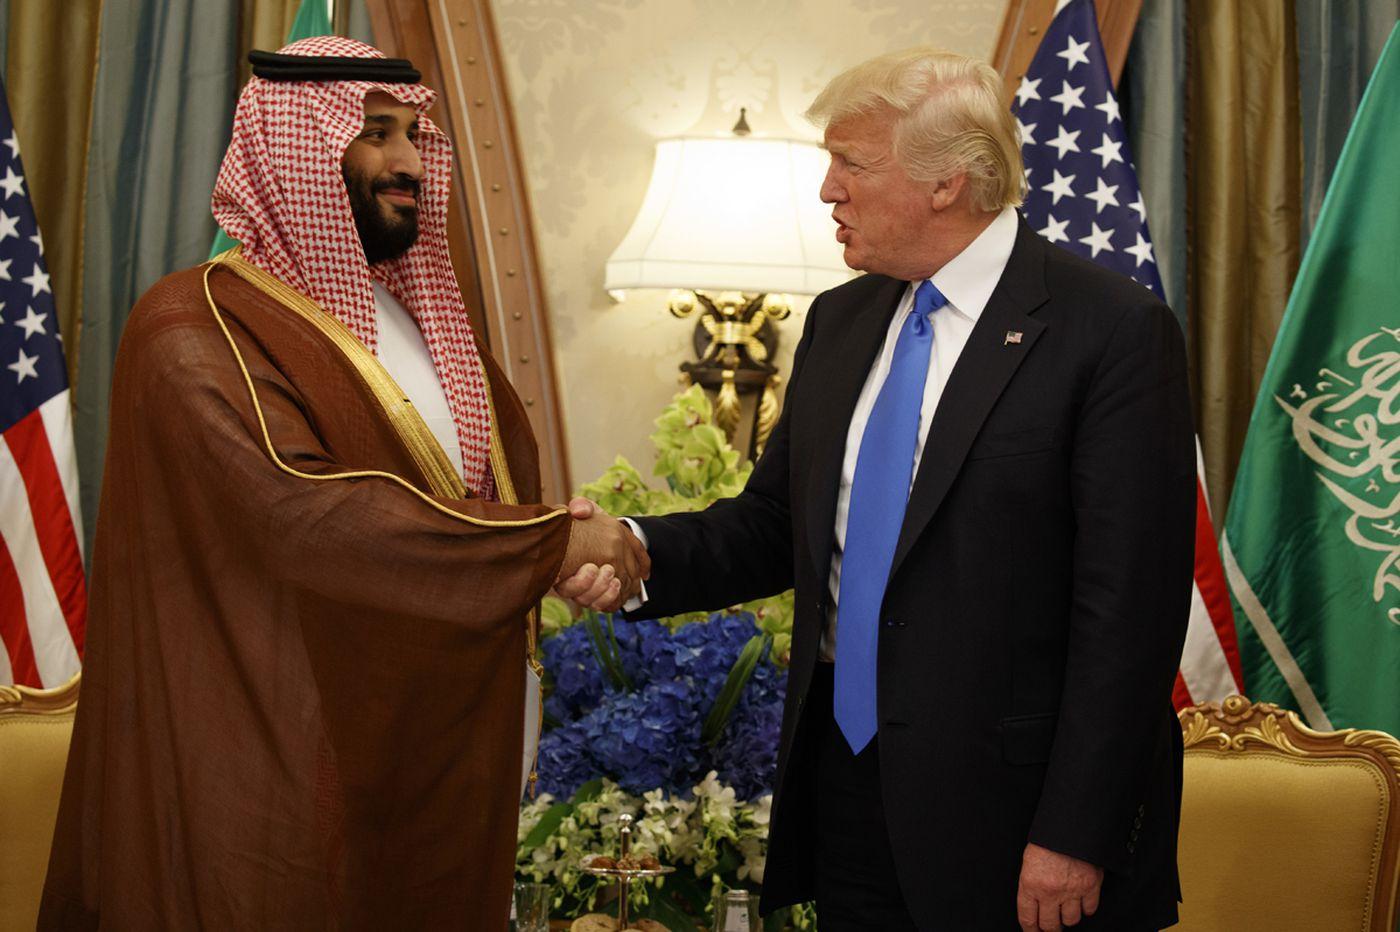 Trump statement sides with Saudi prince in journalist's gruesome murder